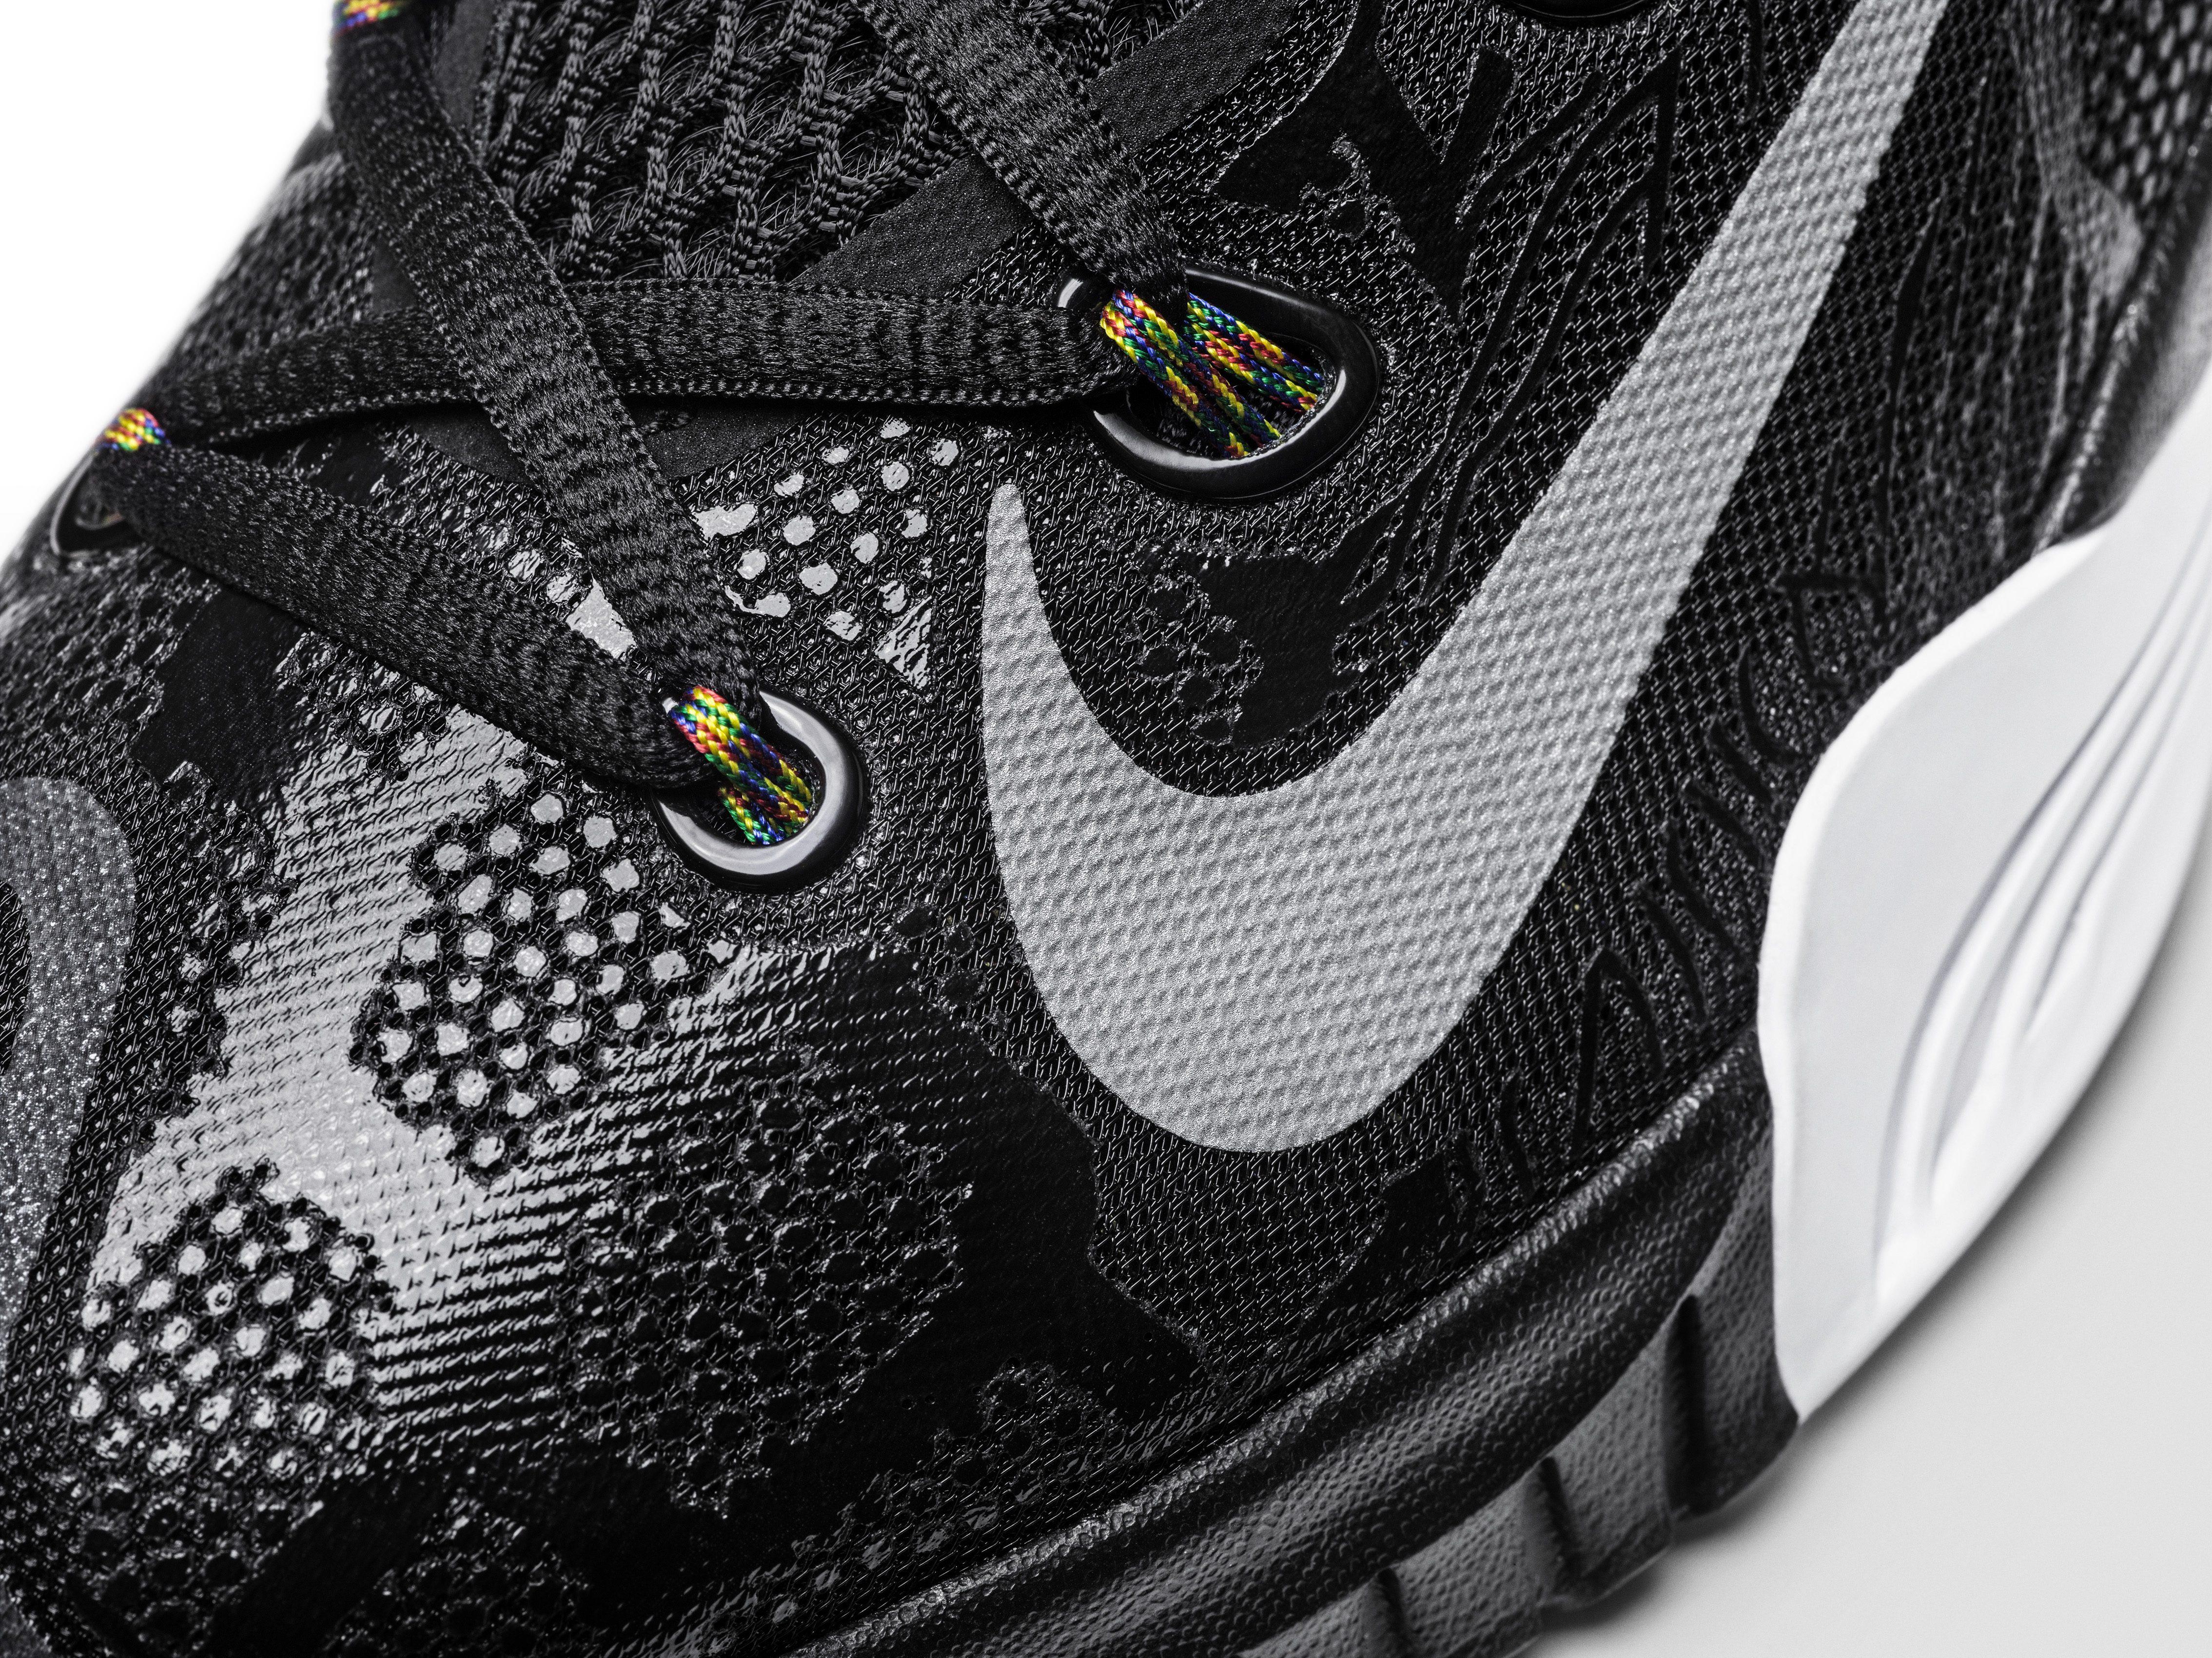 Nike_Net_Collectors_Society_HYPERREV_DET_01_39424